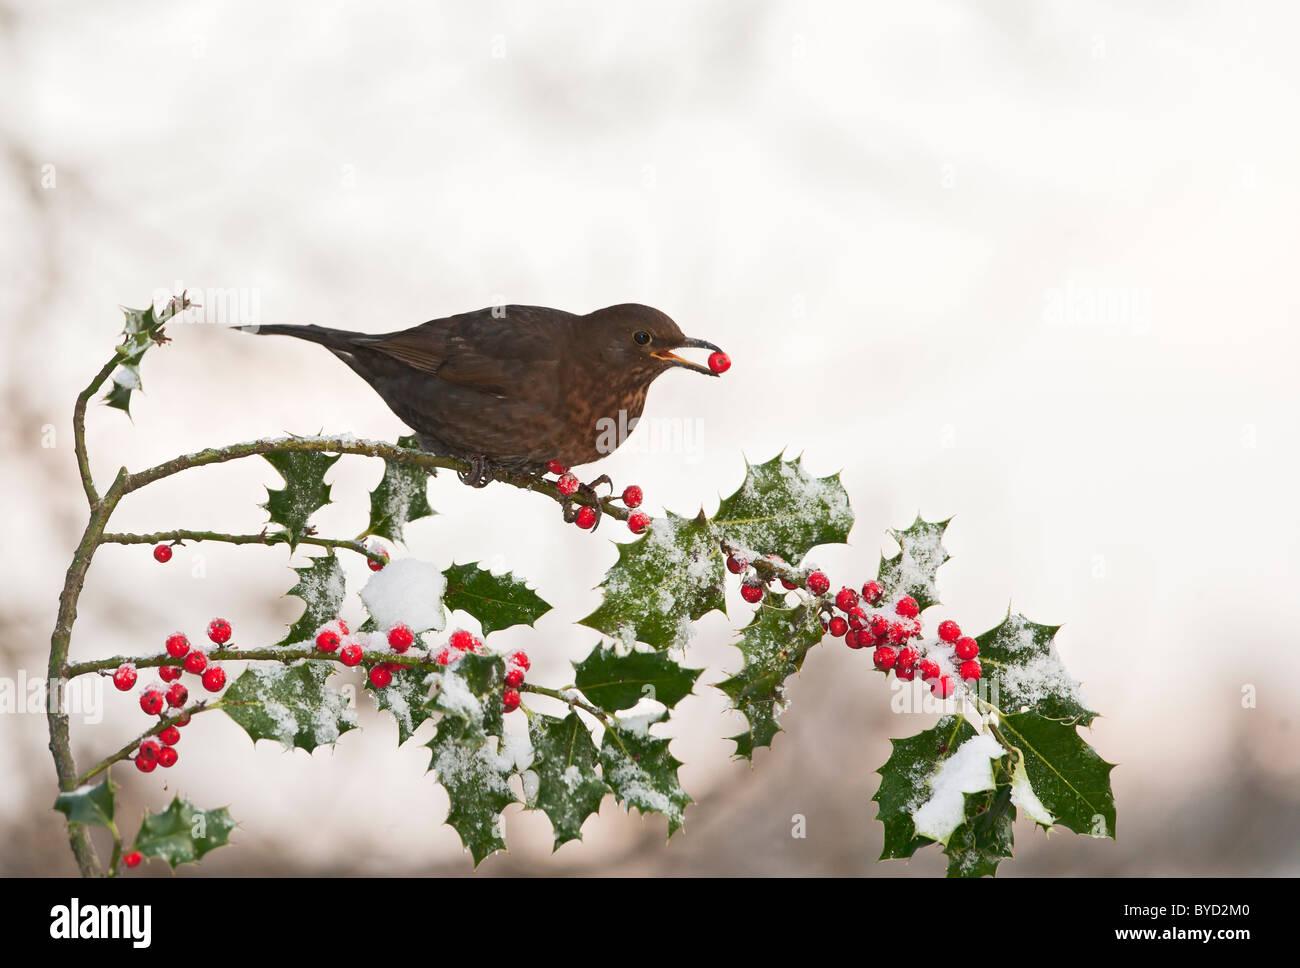 Blackbird ( Turdus merula ) feeding on Holly berries in snow - Stock Image